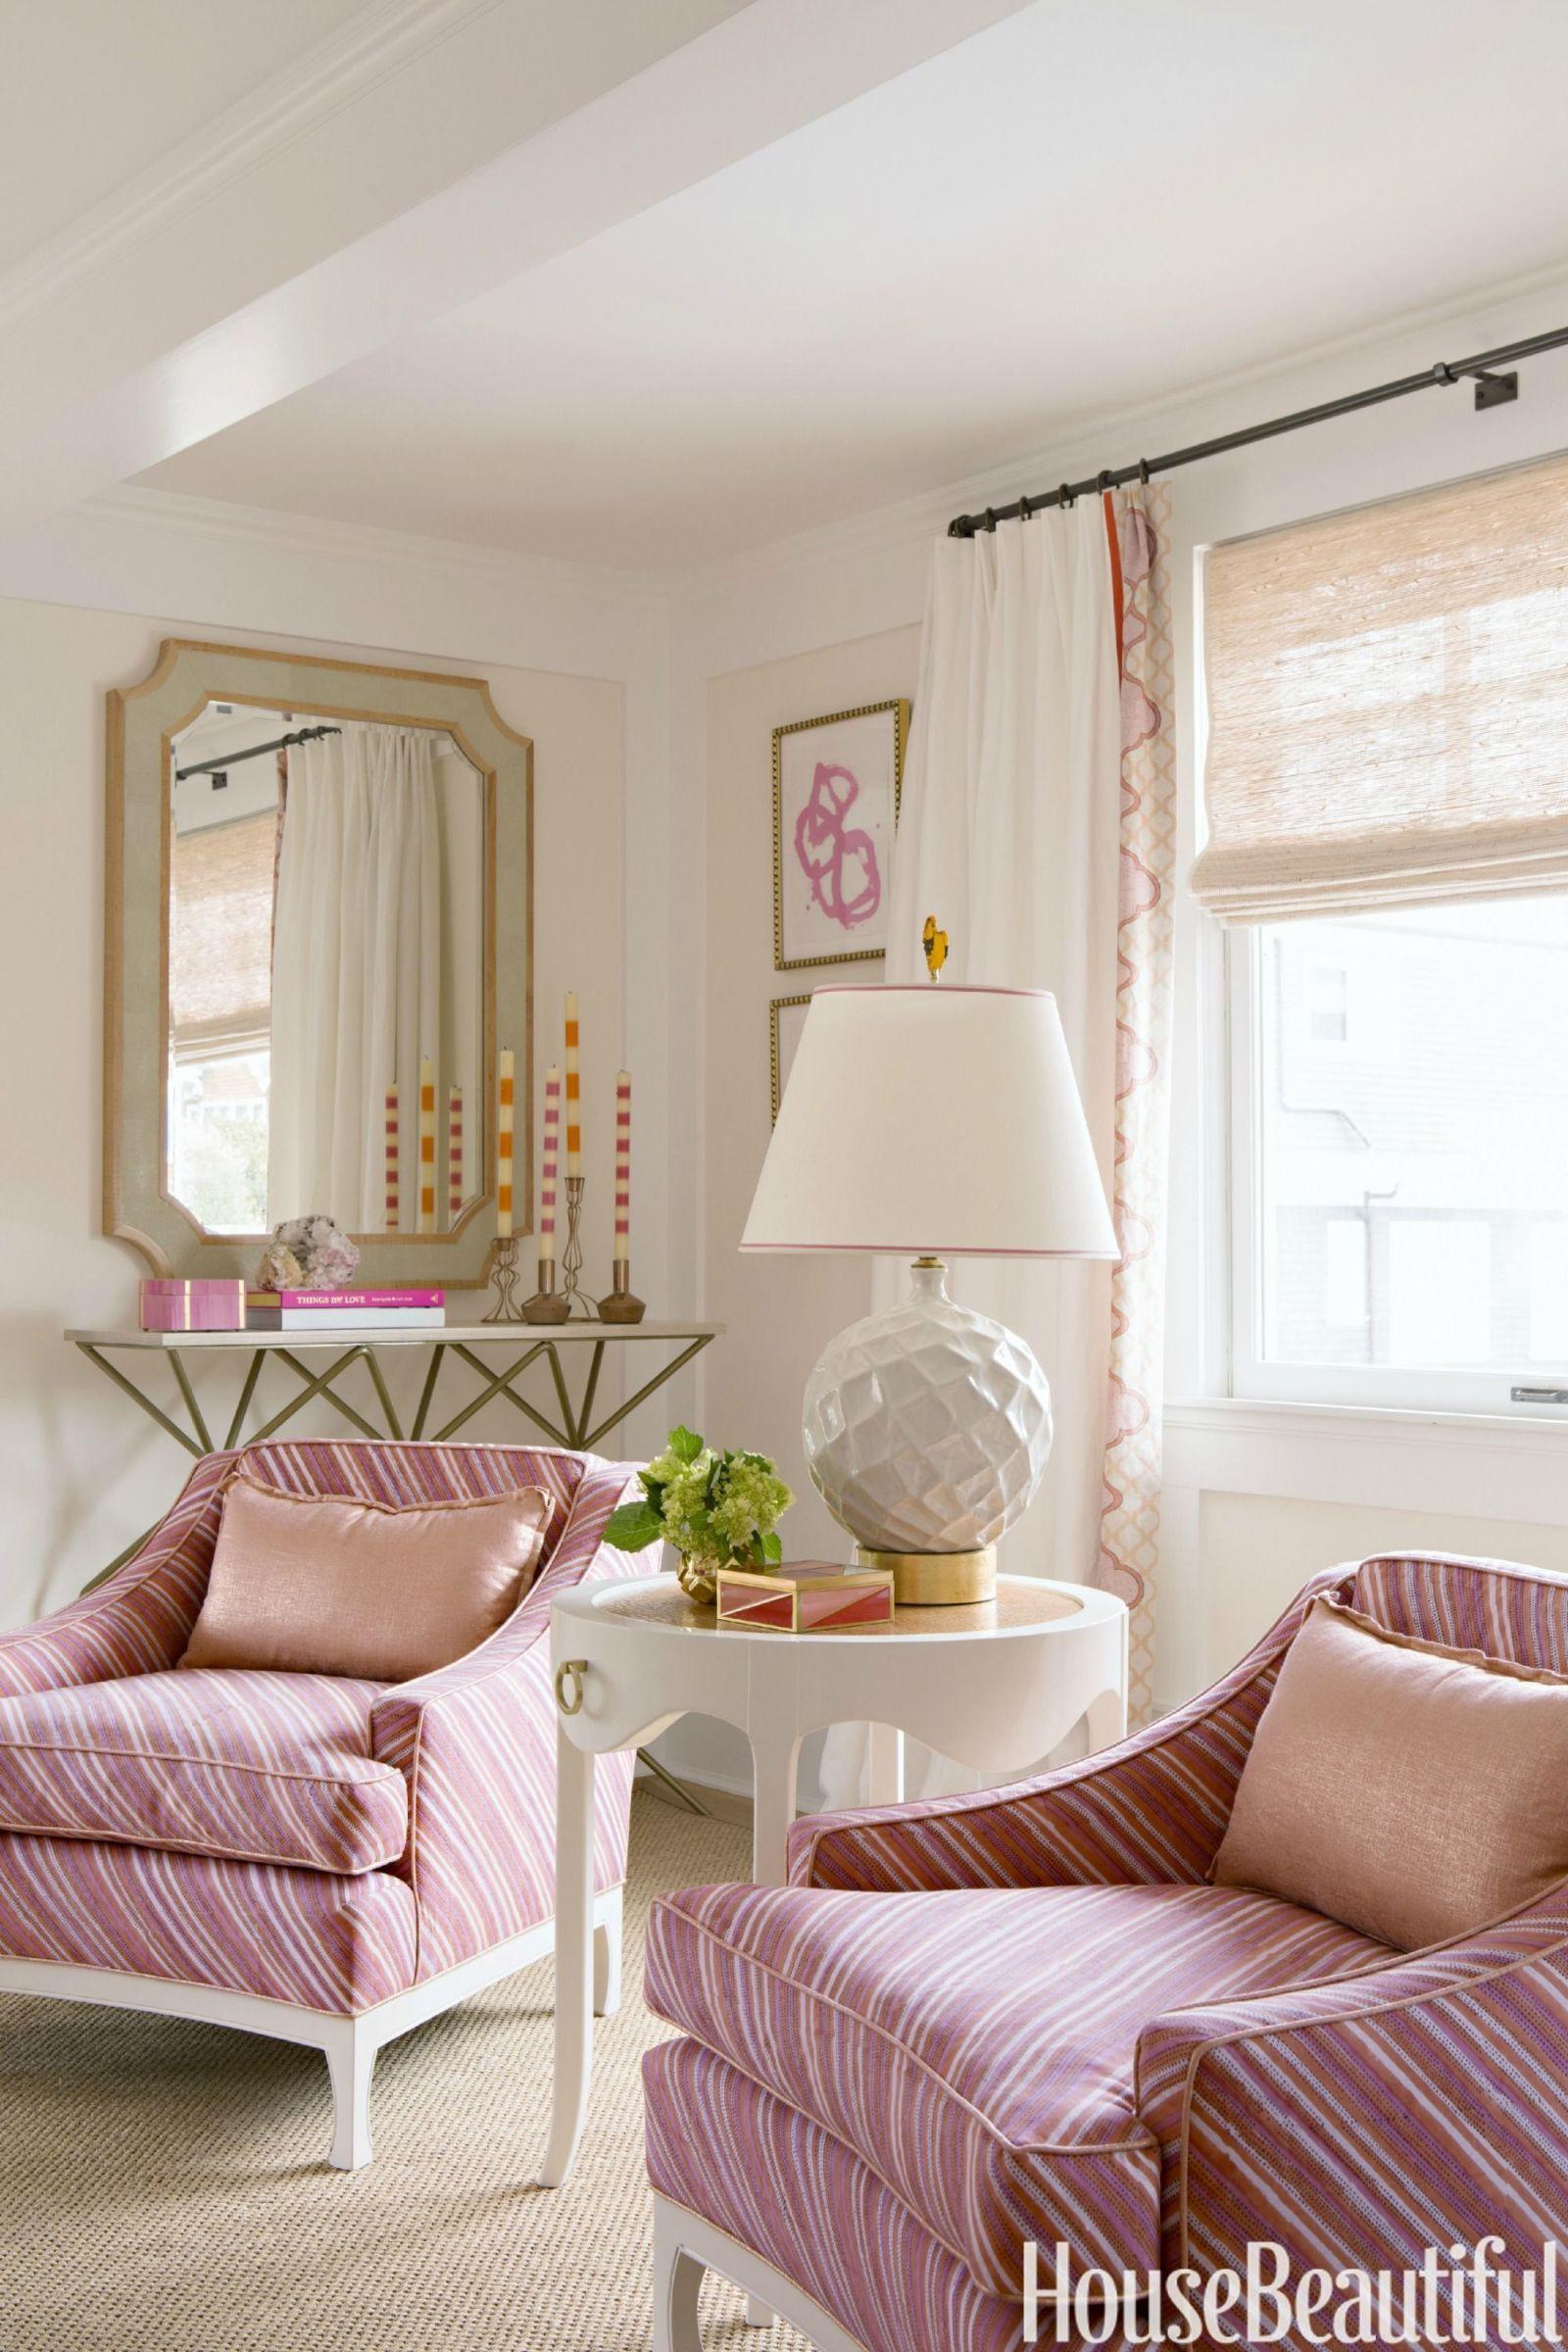 Living Room Windows Design: A Spirited, Pastel Paradise In San Francisco